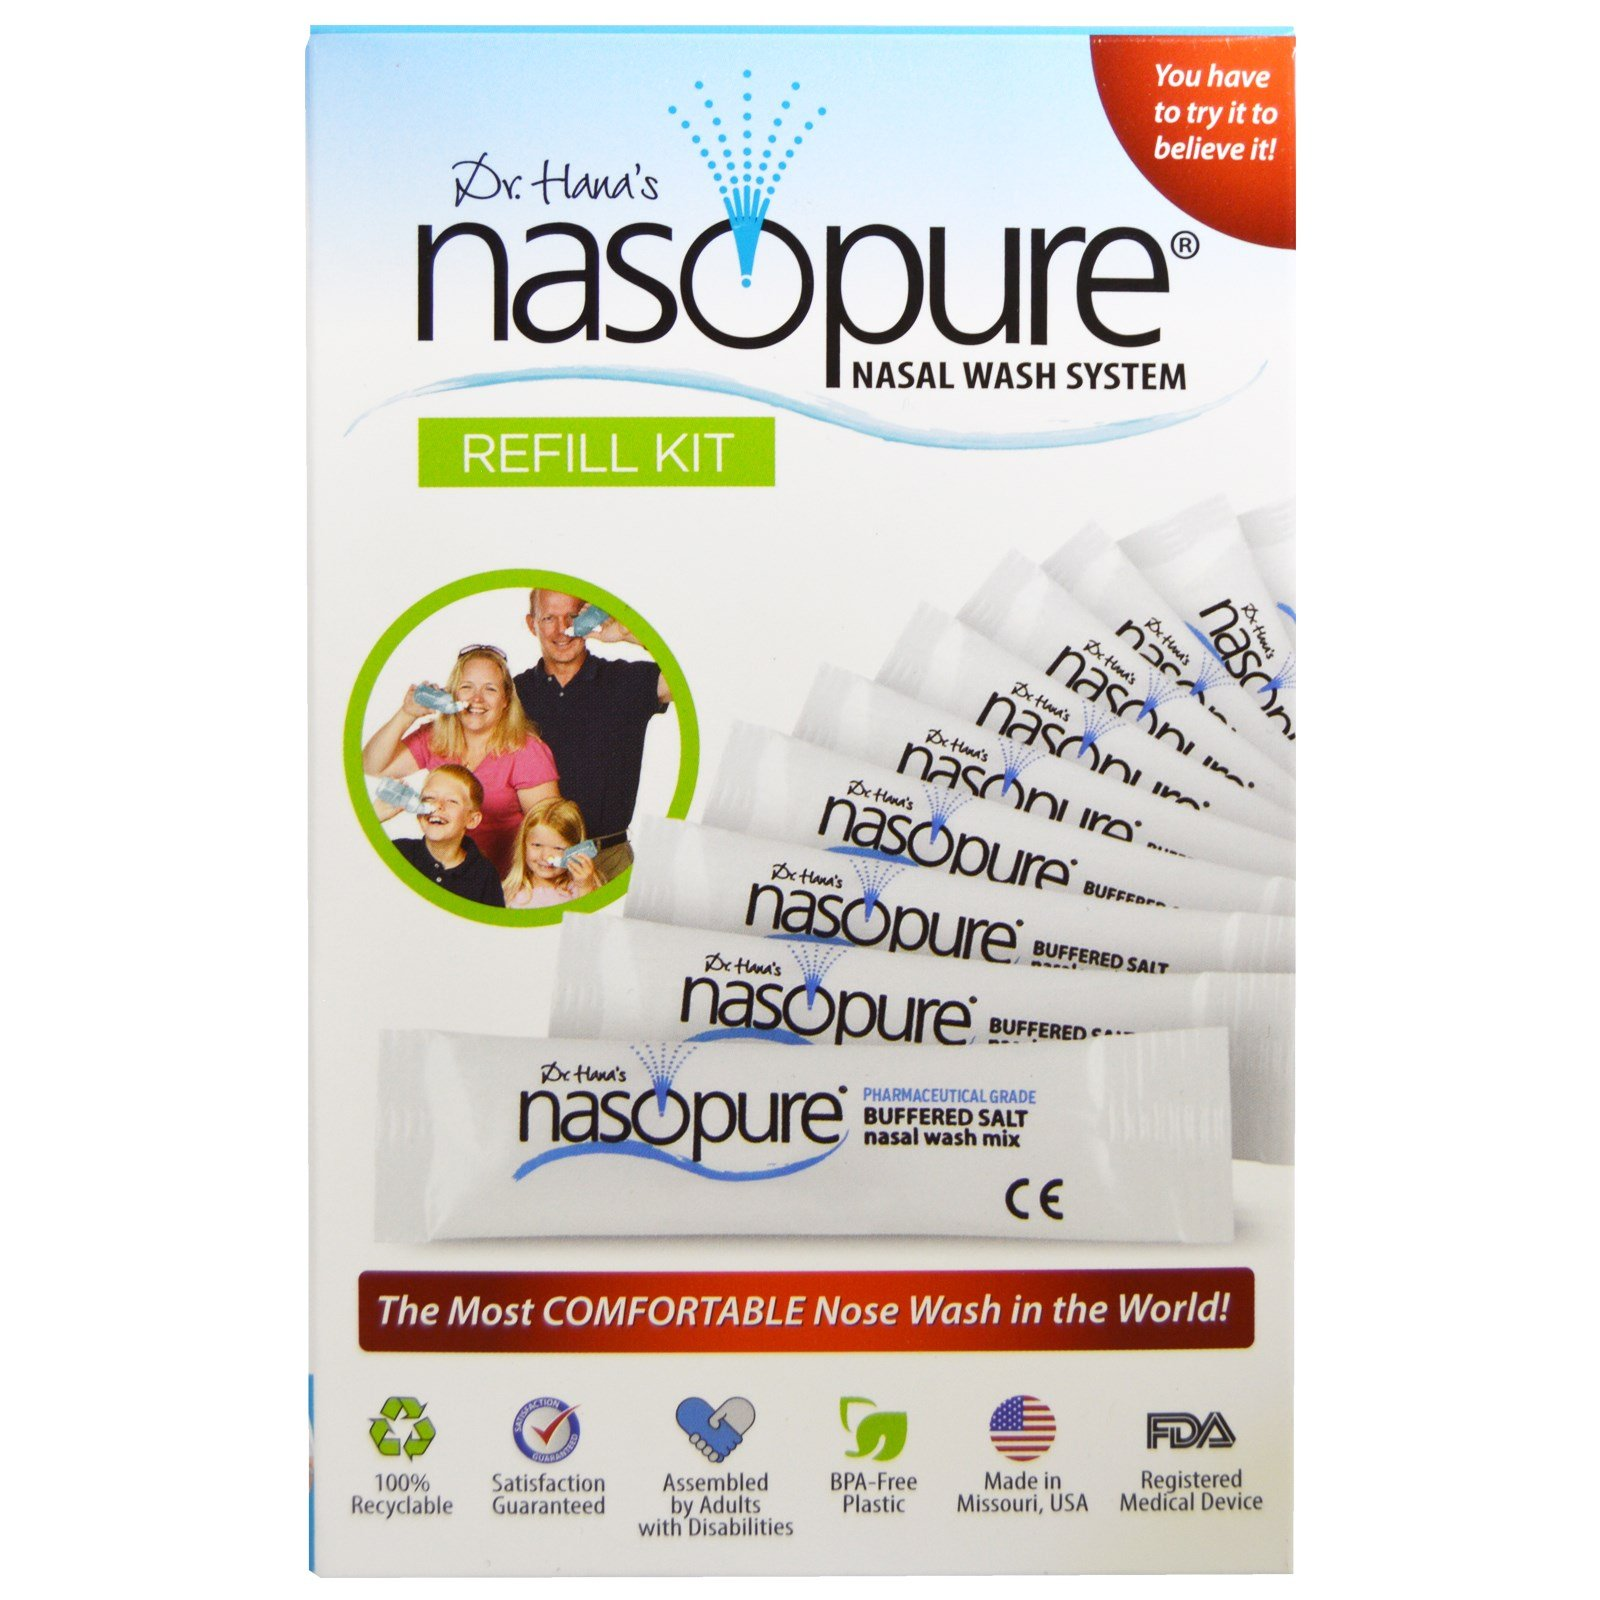 Nasopure Nasal Wash System Refill Kit 1 Kit Iherb